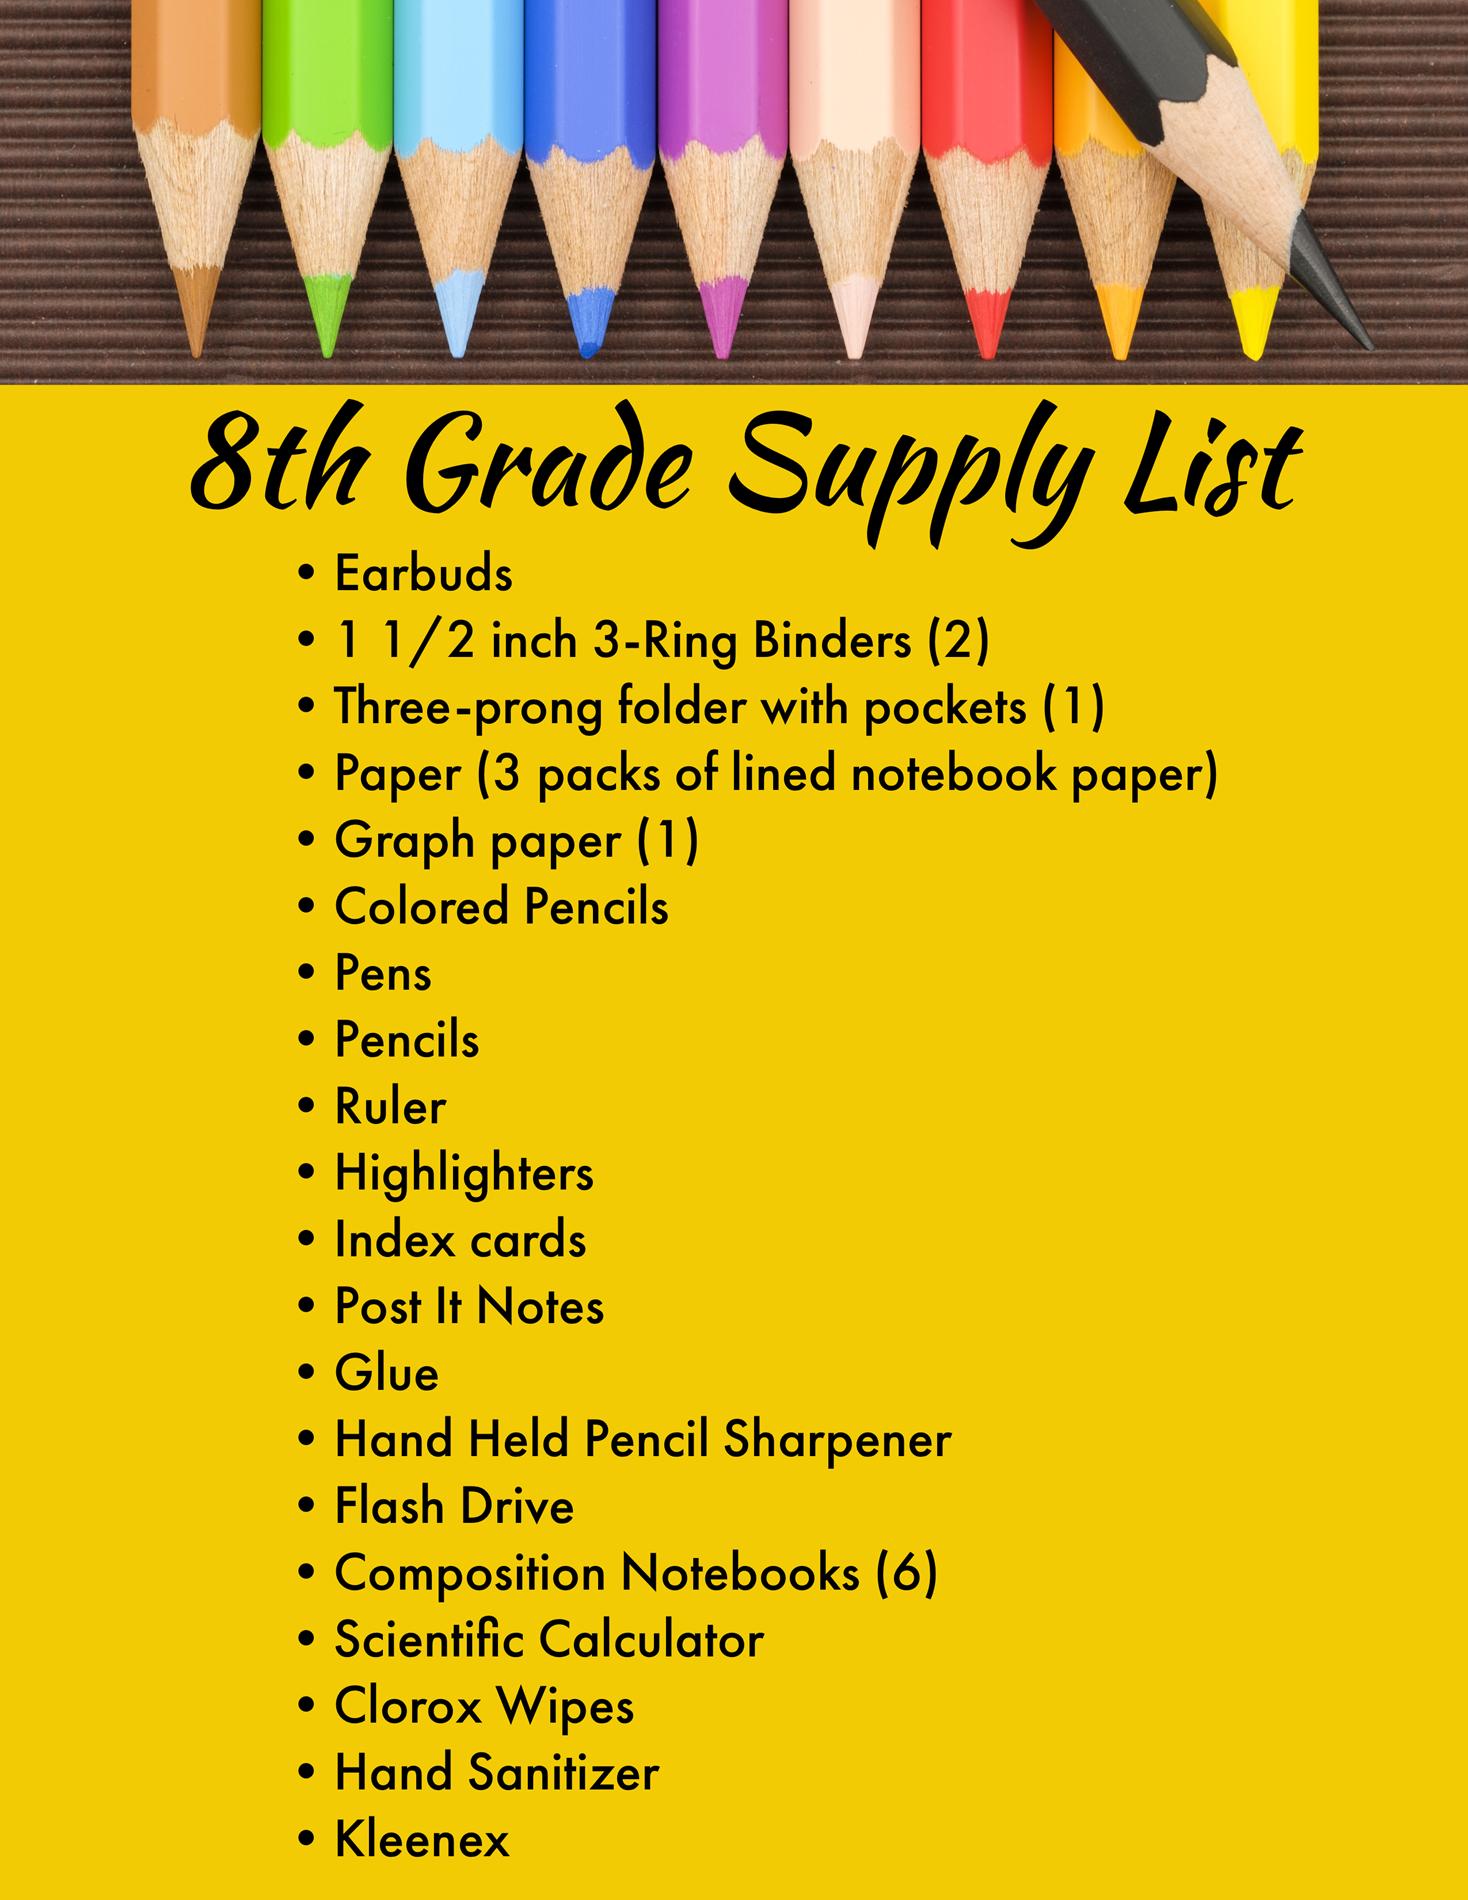 8th grade supplies